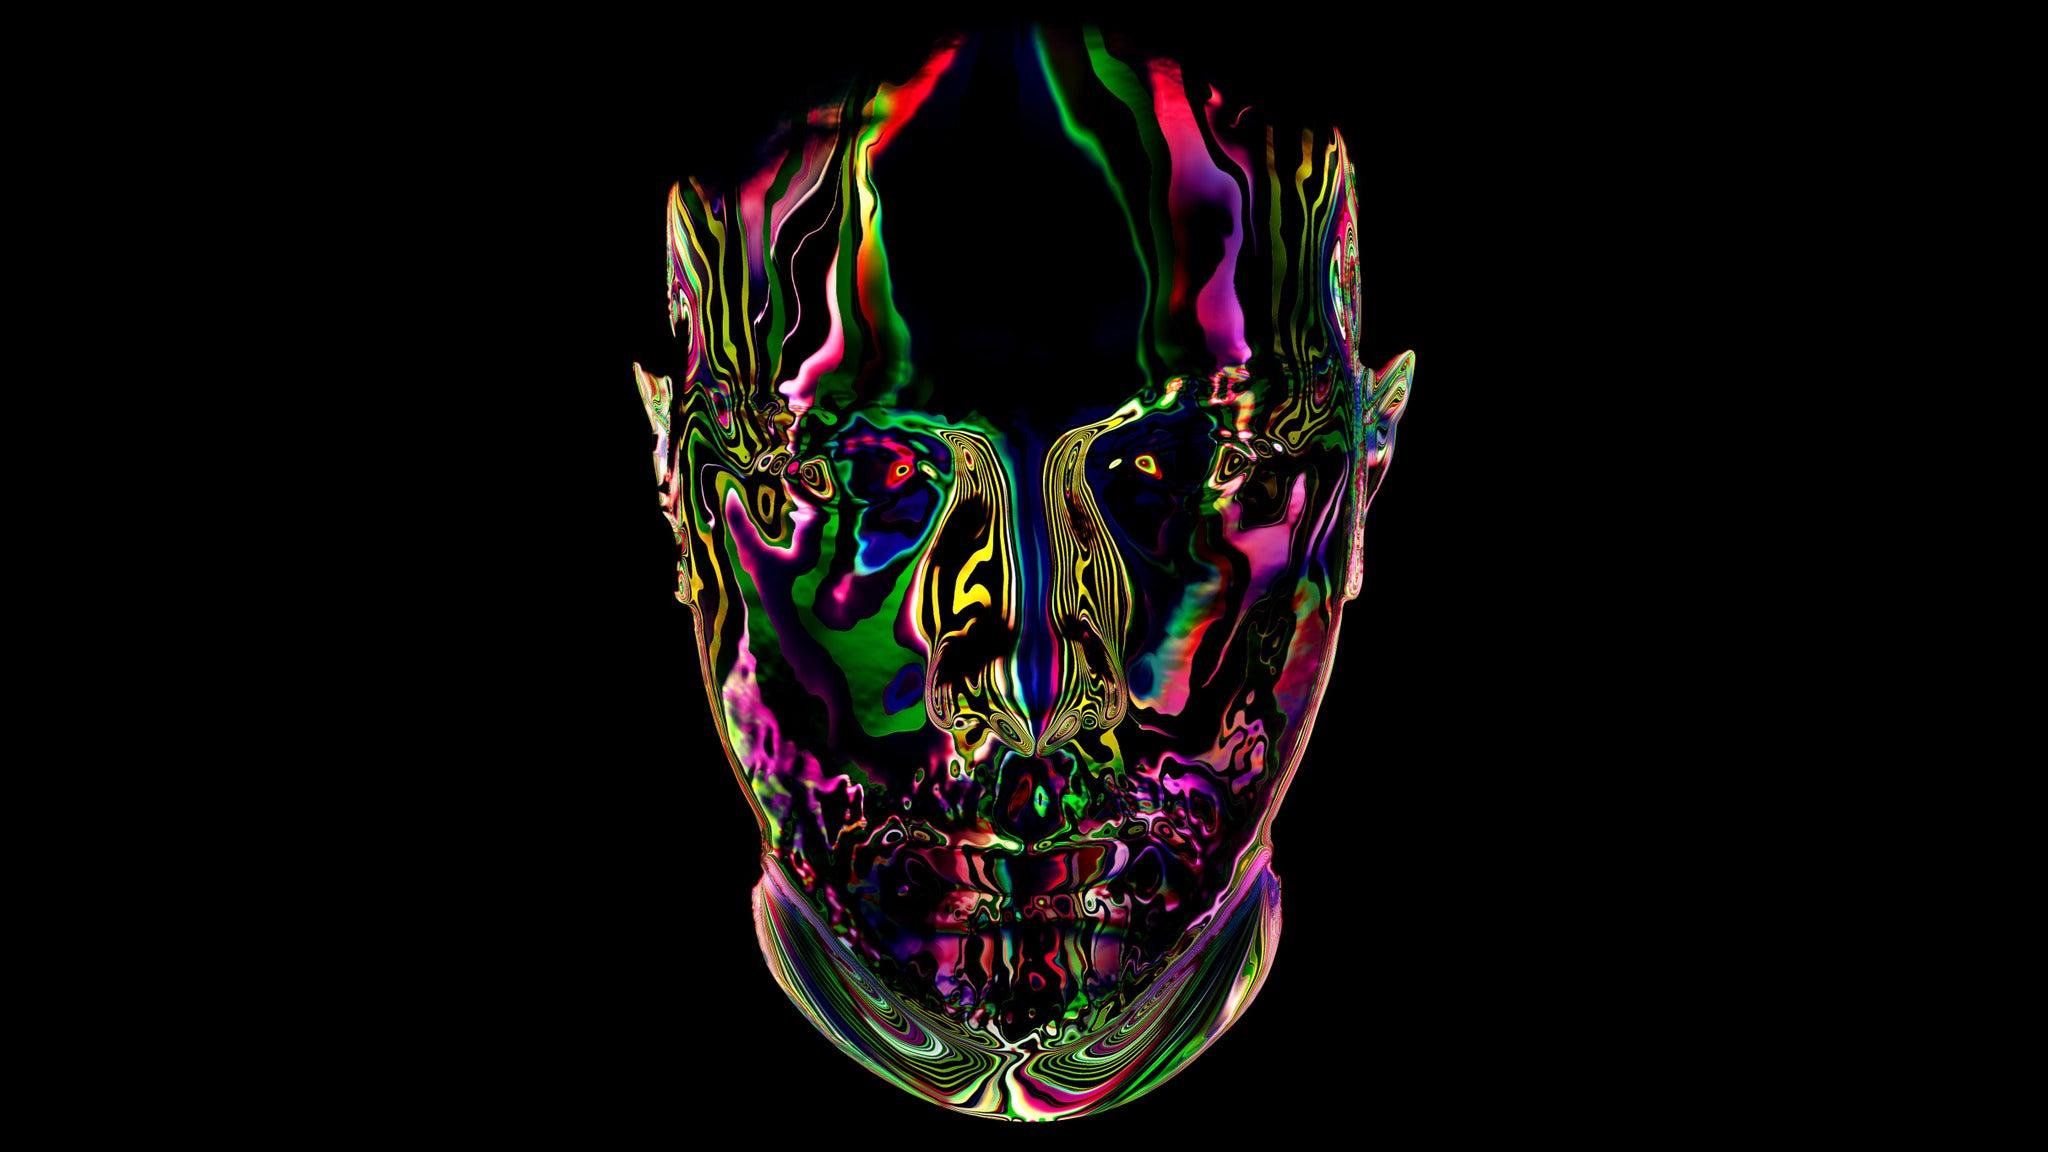 NYE feat. Eric Prydz at Echostage